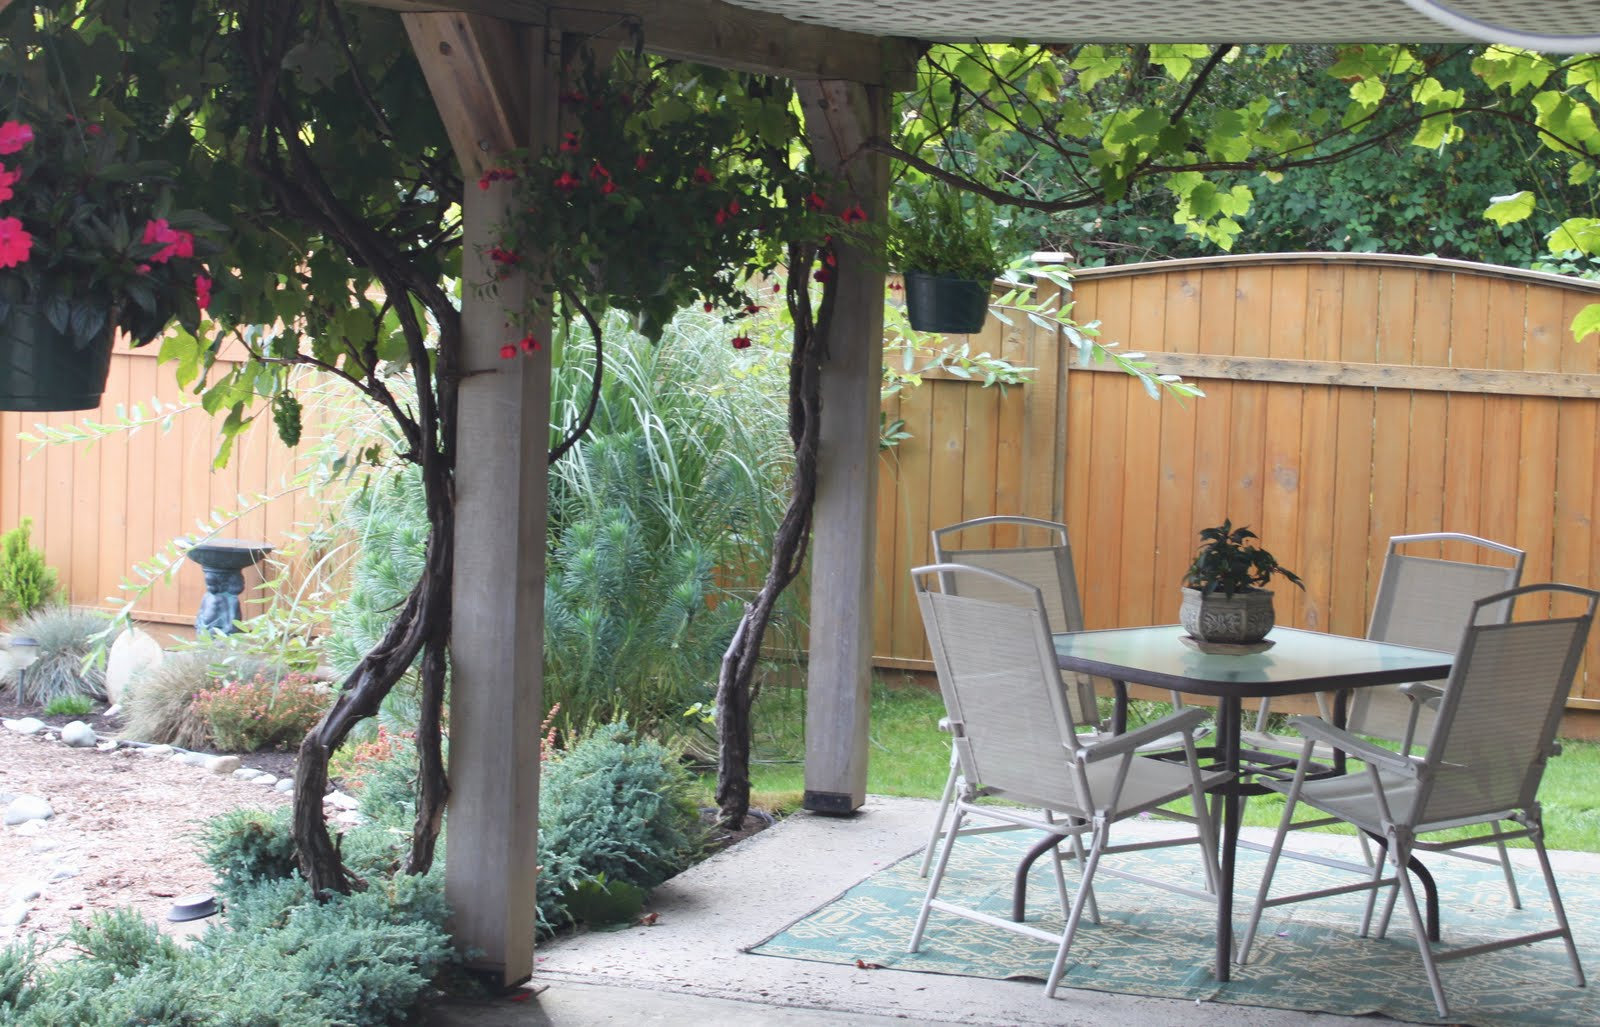 Vancouver Island Travel & Tourism: September 2010